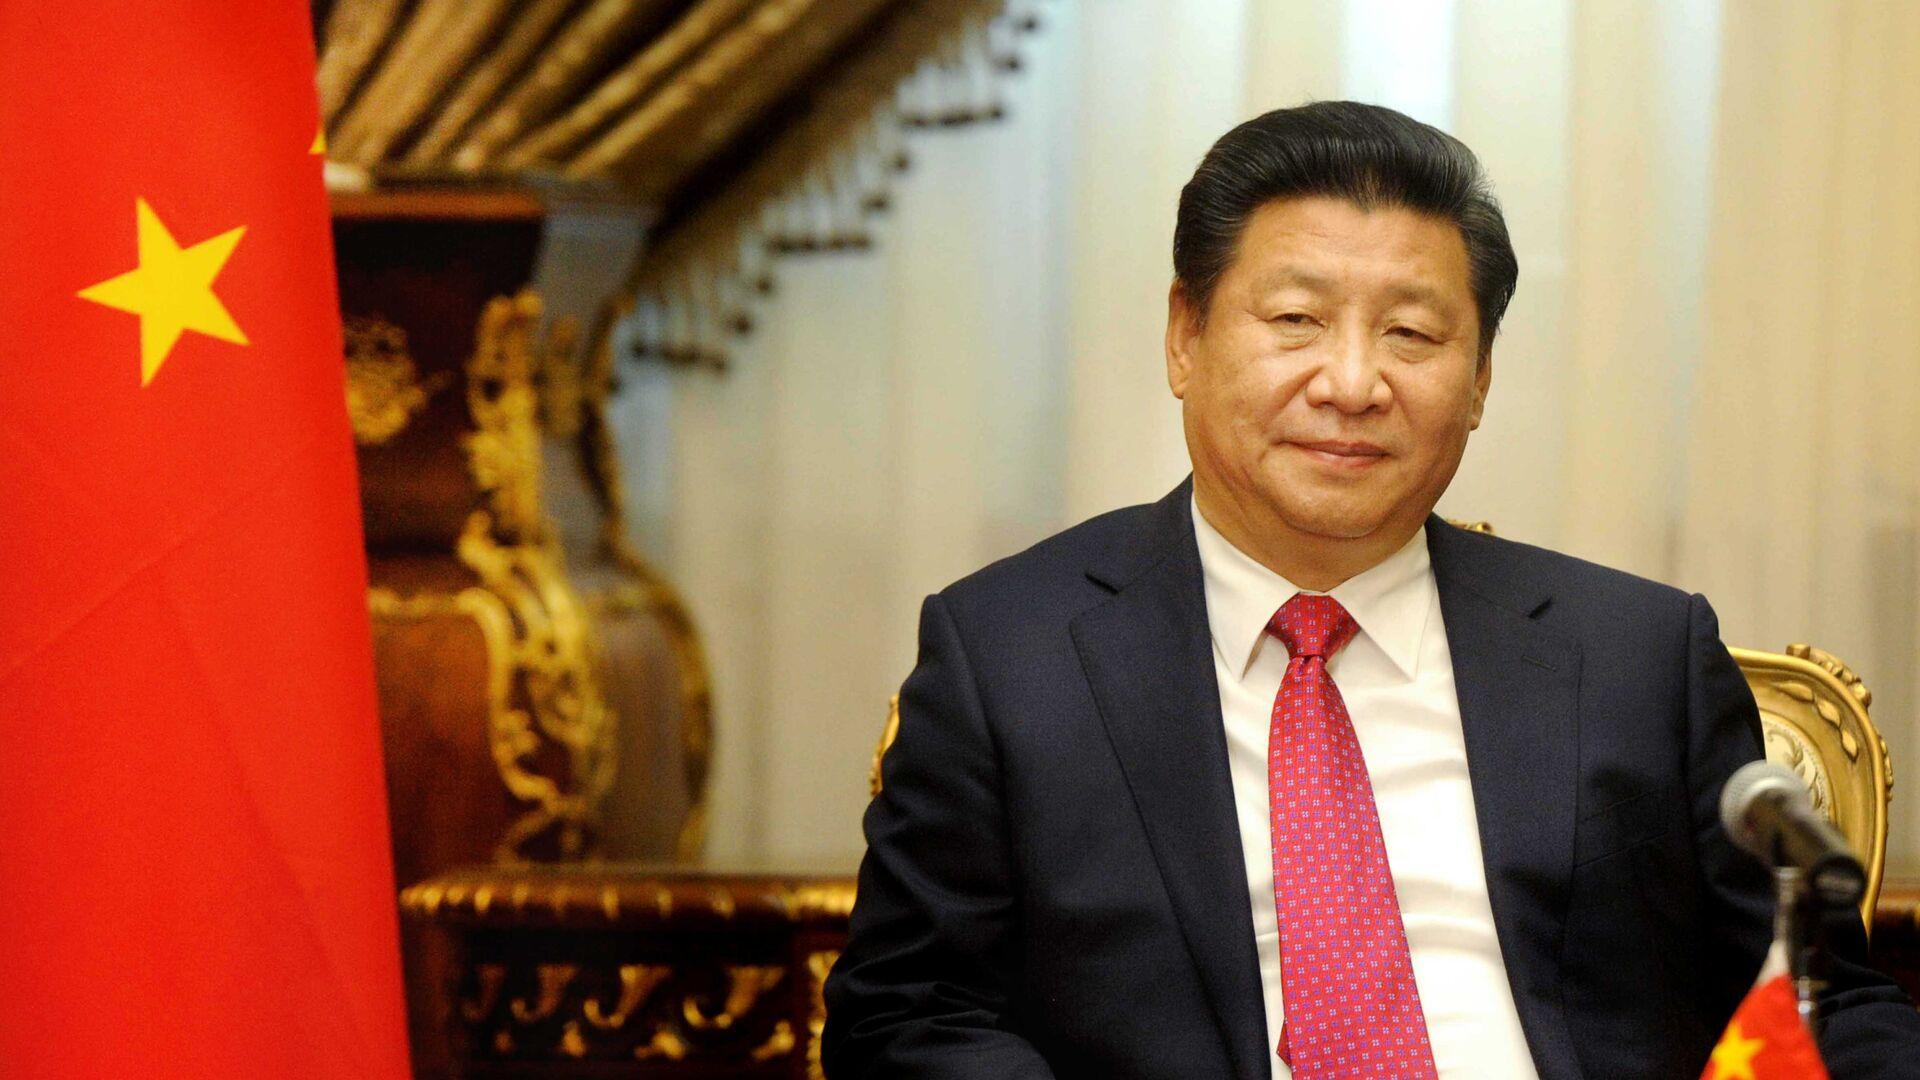 Chinese President Xi Jinping visits the parliament in Cairo, Egypt, Thursday, Jan. 21, 2016. - Sputnik Mundo, 1920, 09.02.2021